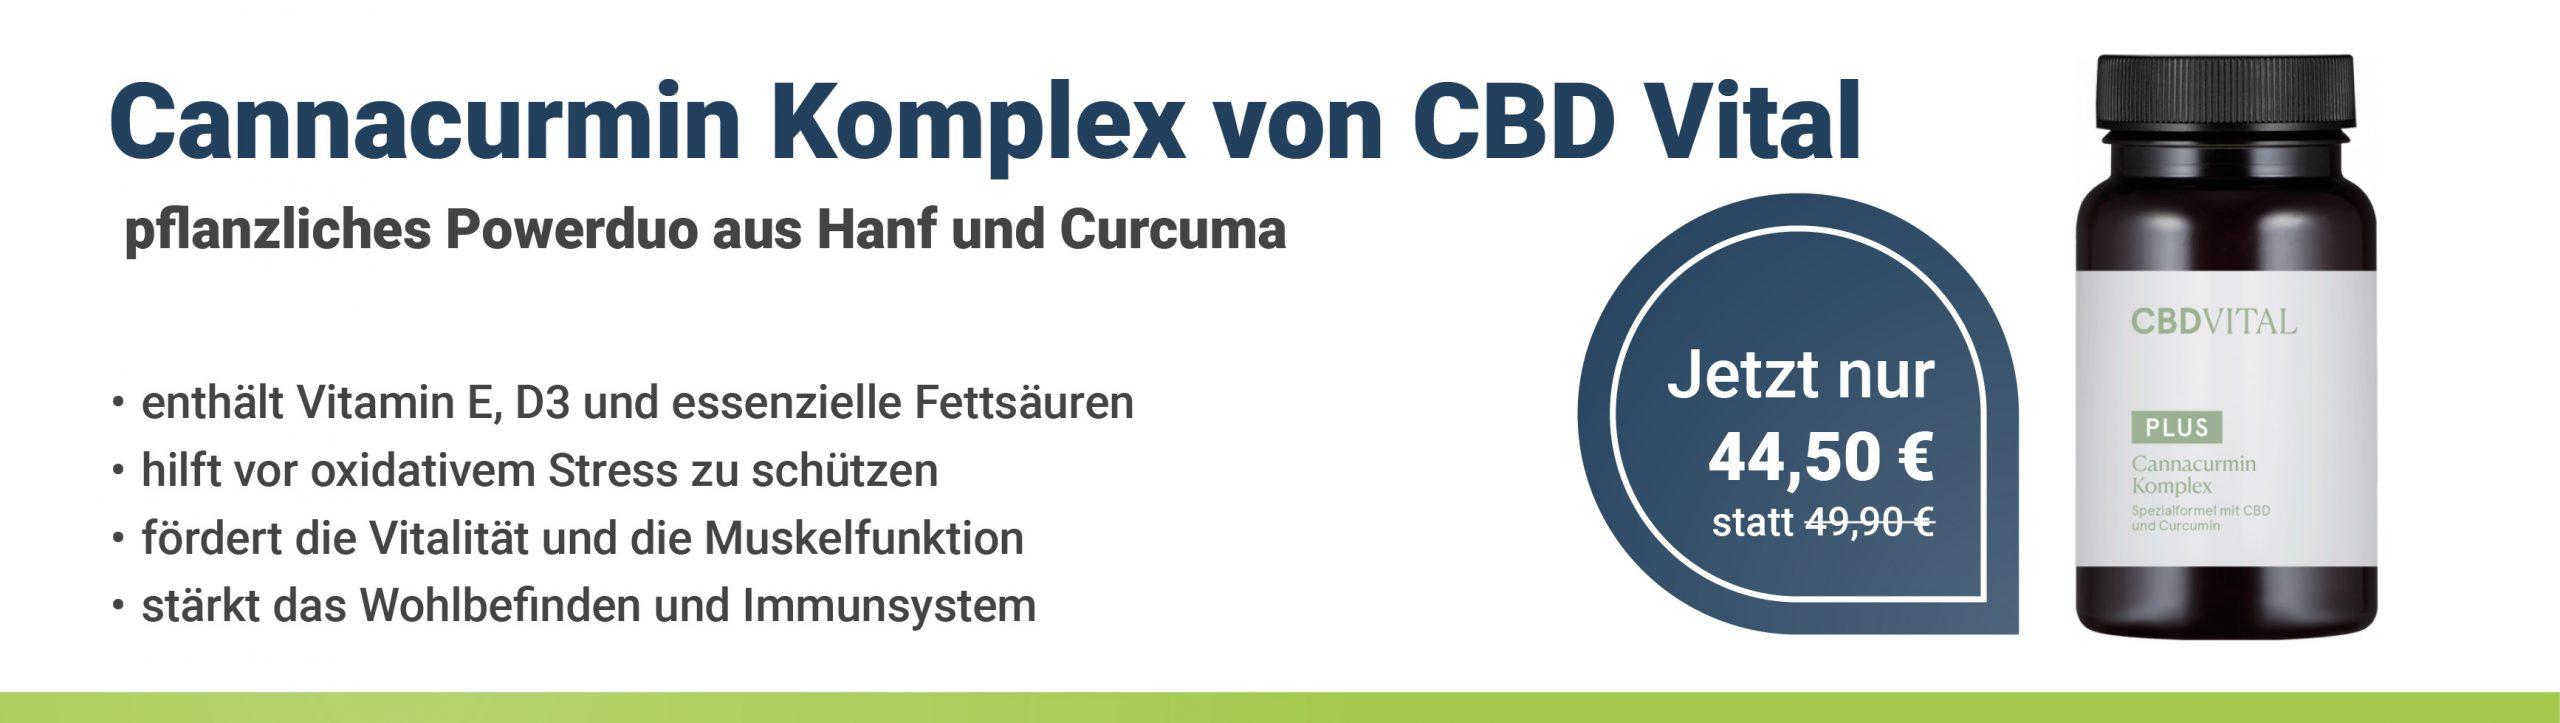 https://www.health-rise.de/wp-content/uploads/2021/09/Cannacurmin_mobil.jpg